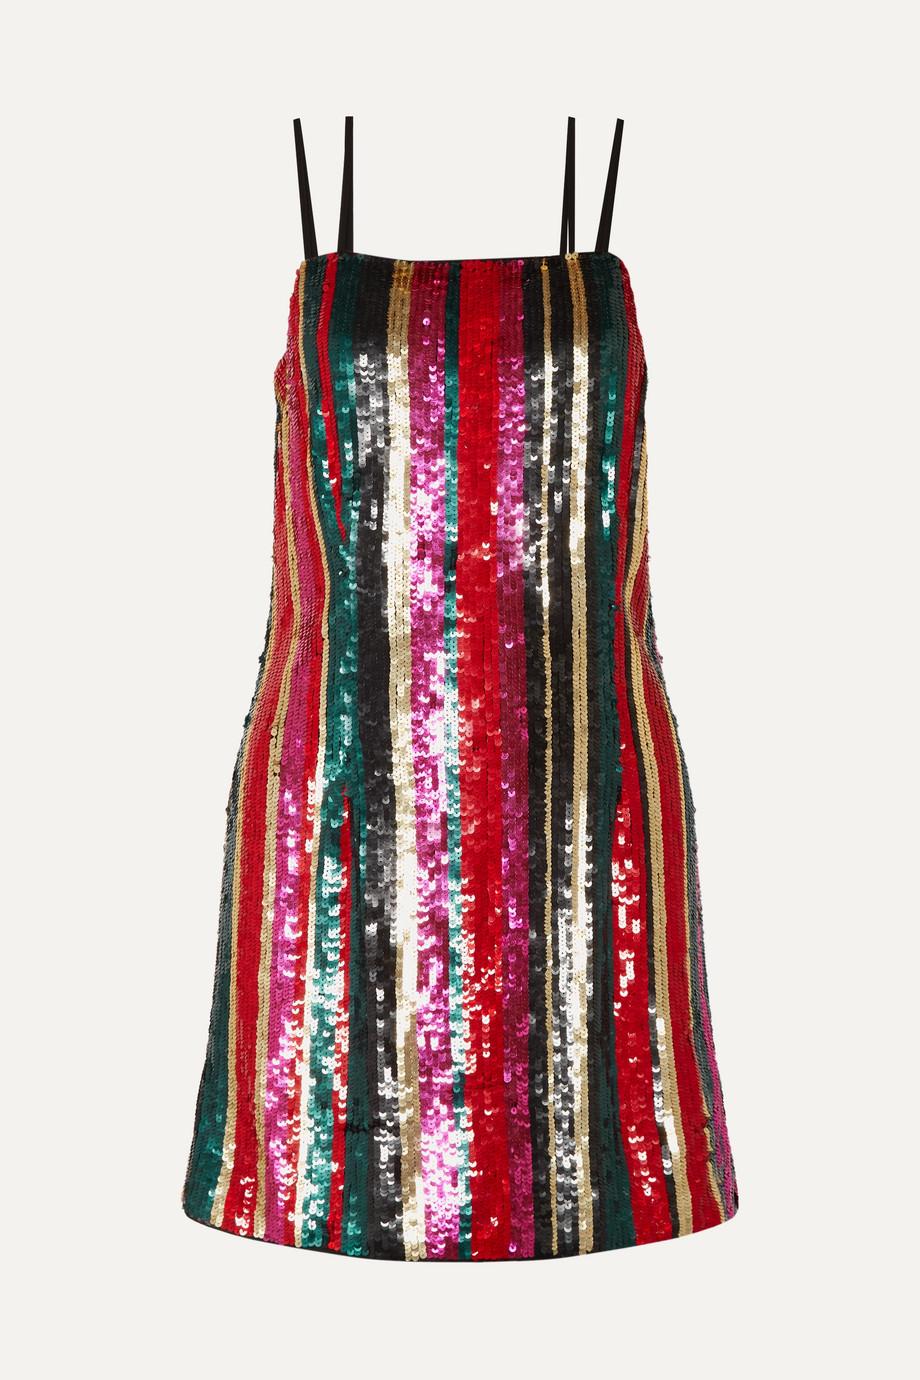 Haney Elektra striped sequined tulle mini dress